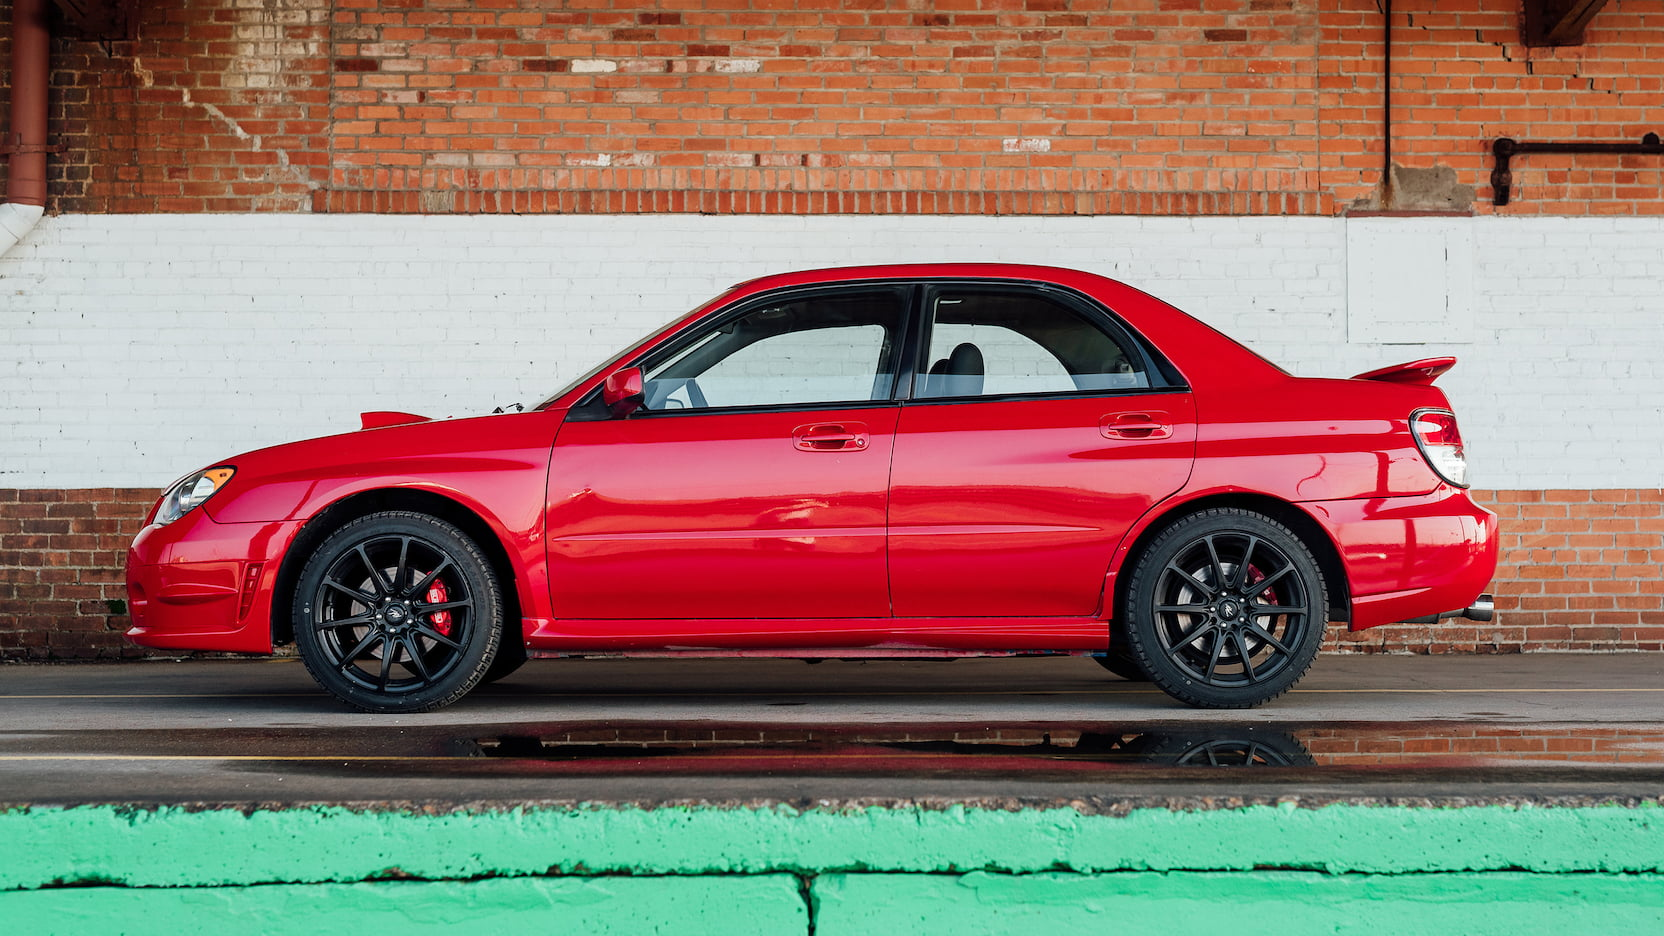 2006 Subaru WRX coupe profile